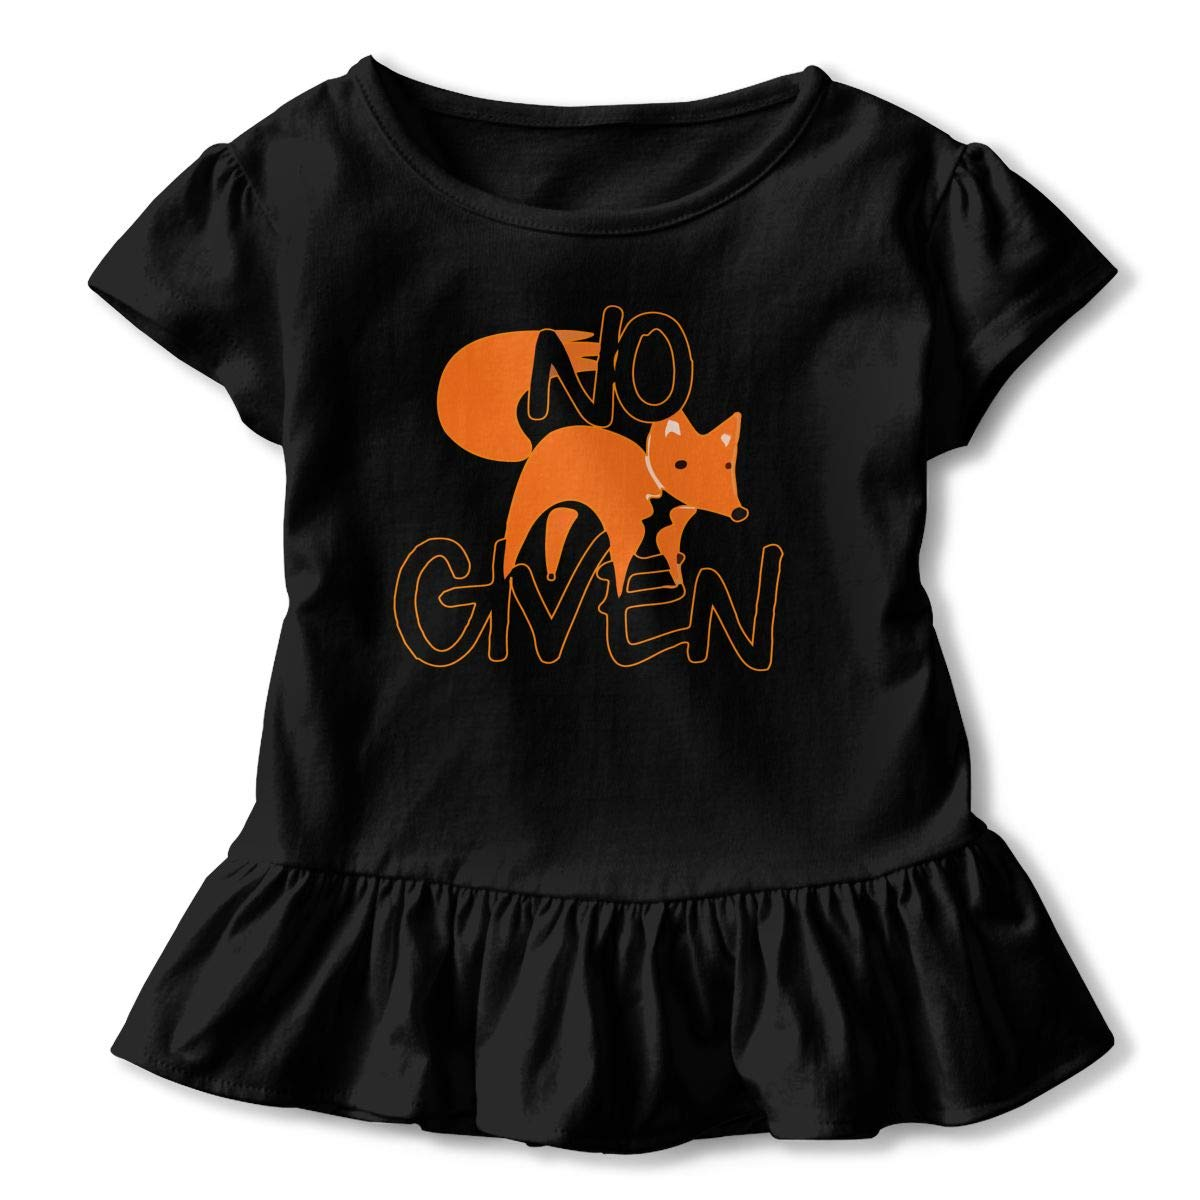 Funny No Fox Given Toddler Baby Girls Short Sleeve Ruffle T-Shirt